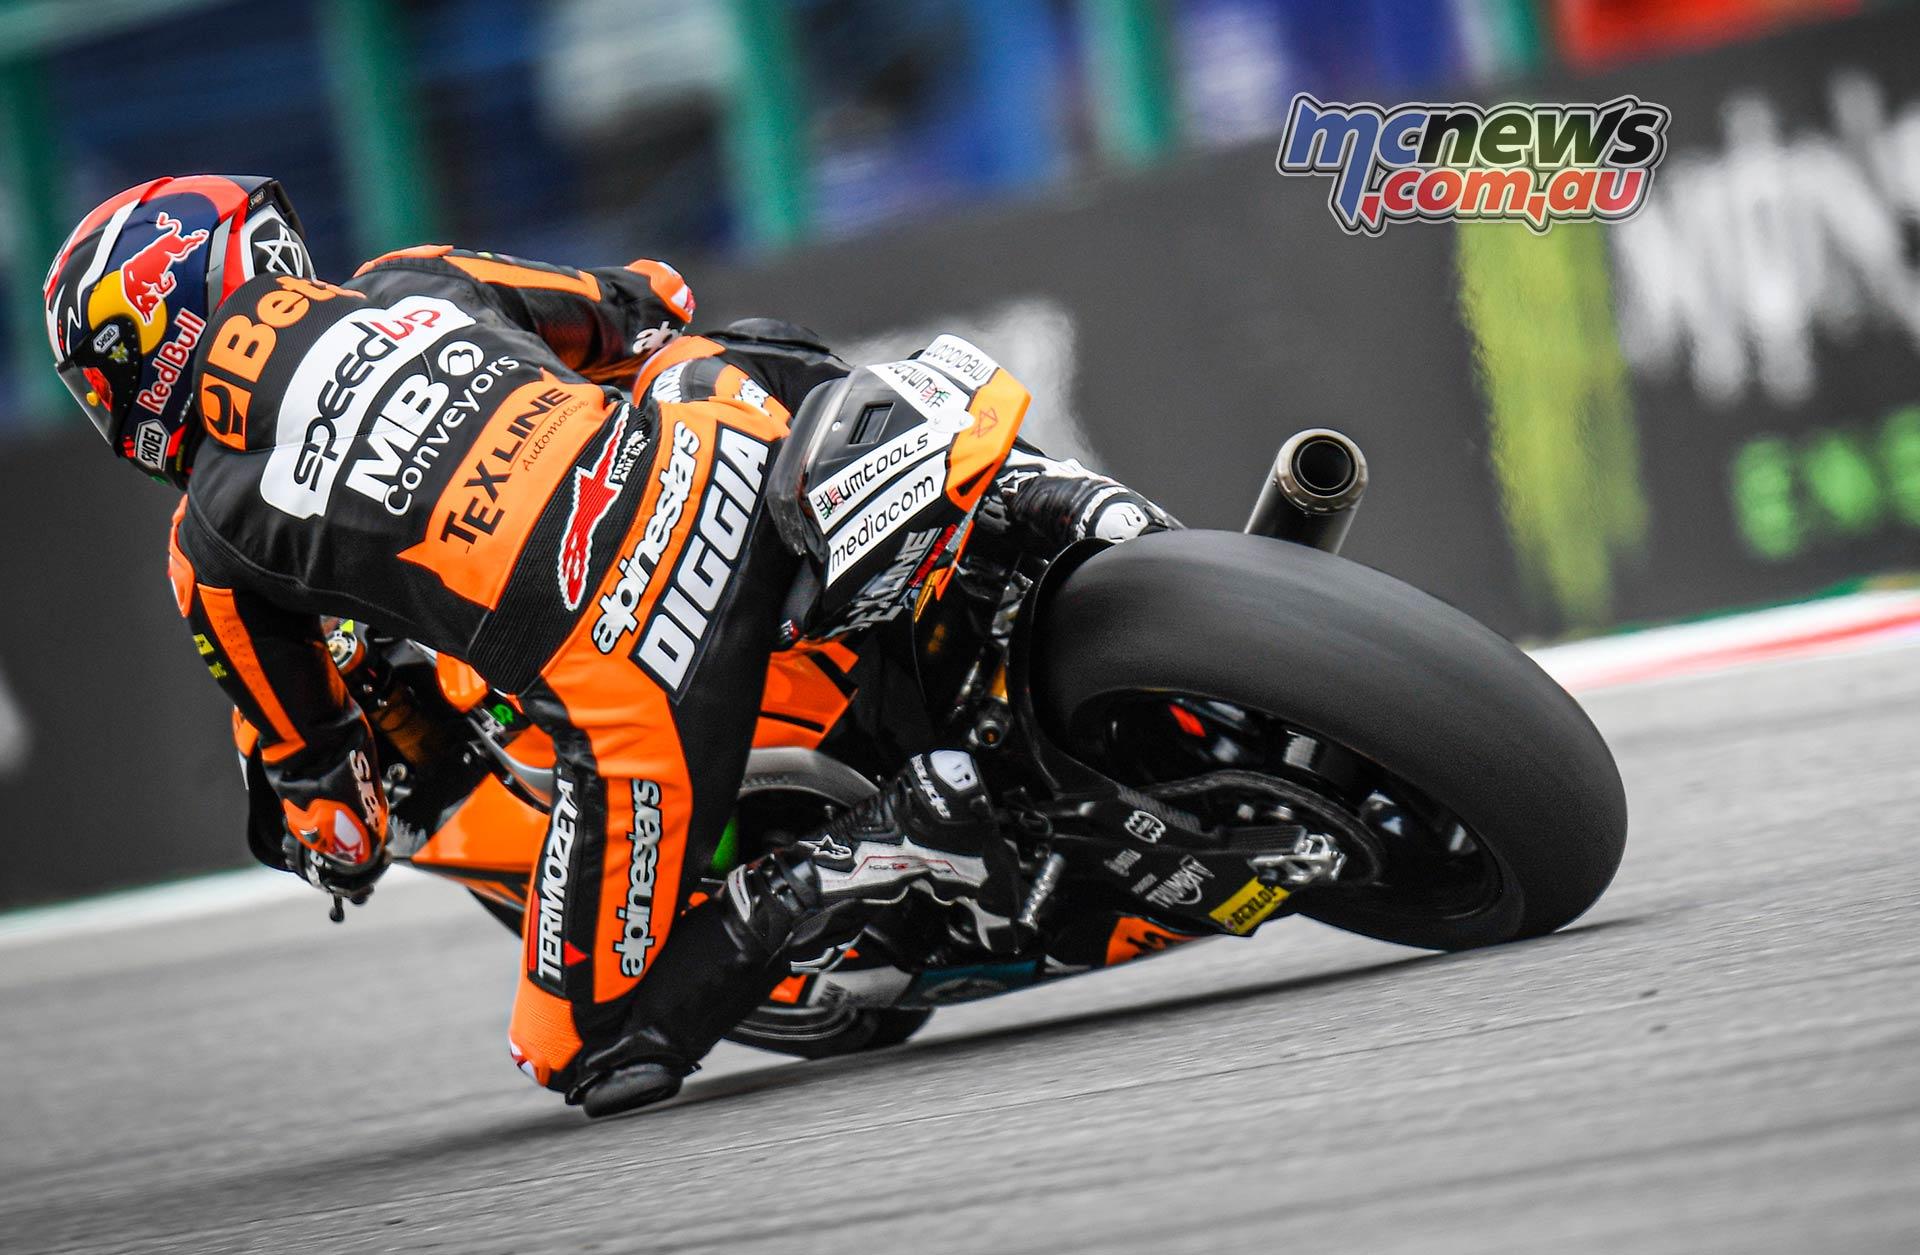 MotoGP Round Brno Fri Moto DiGiannanntonio